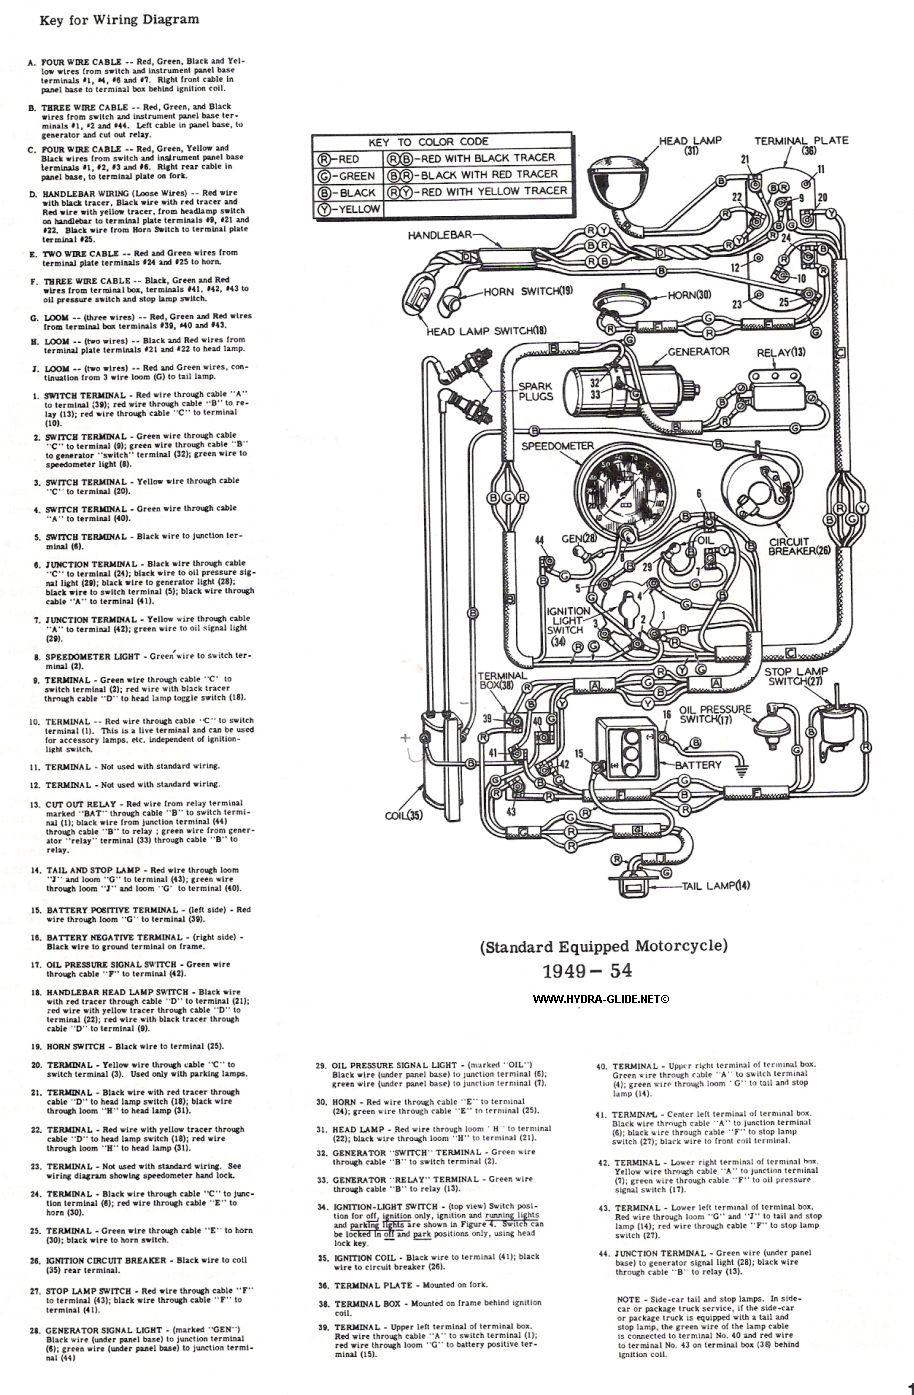 12 Volt Coil Wiring Diagram - Wiring Diagram Data Oreo - 12V Wiring Diagram